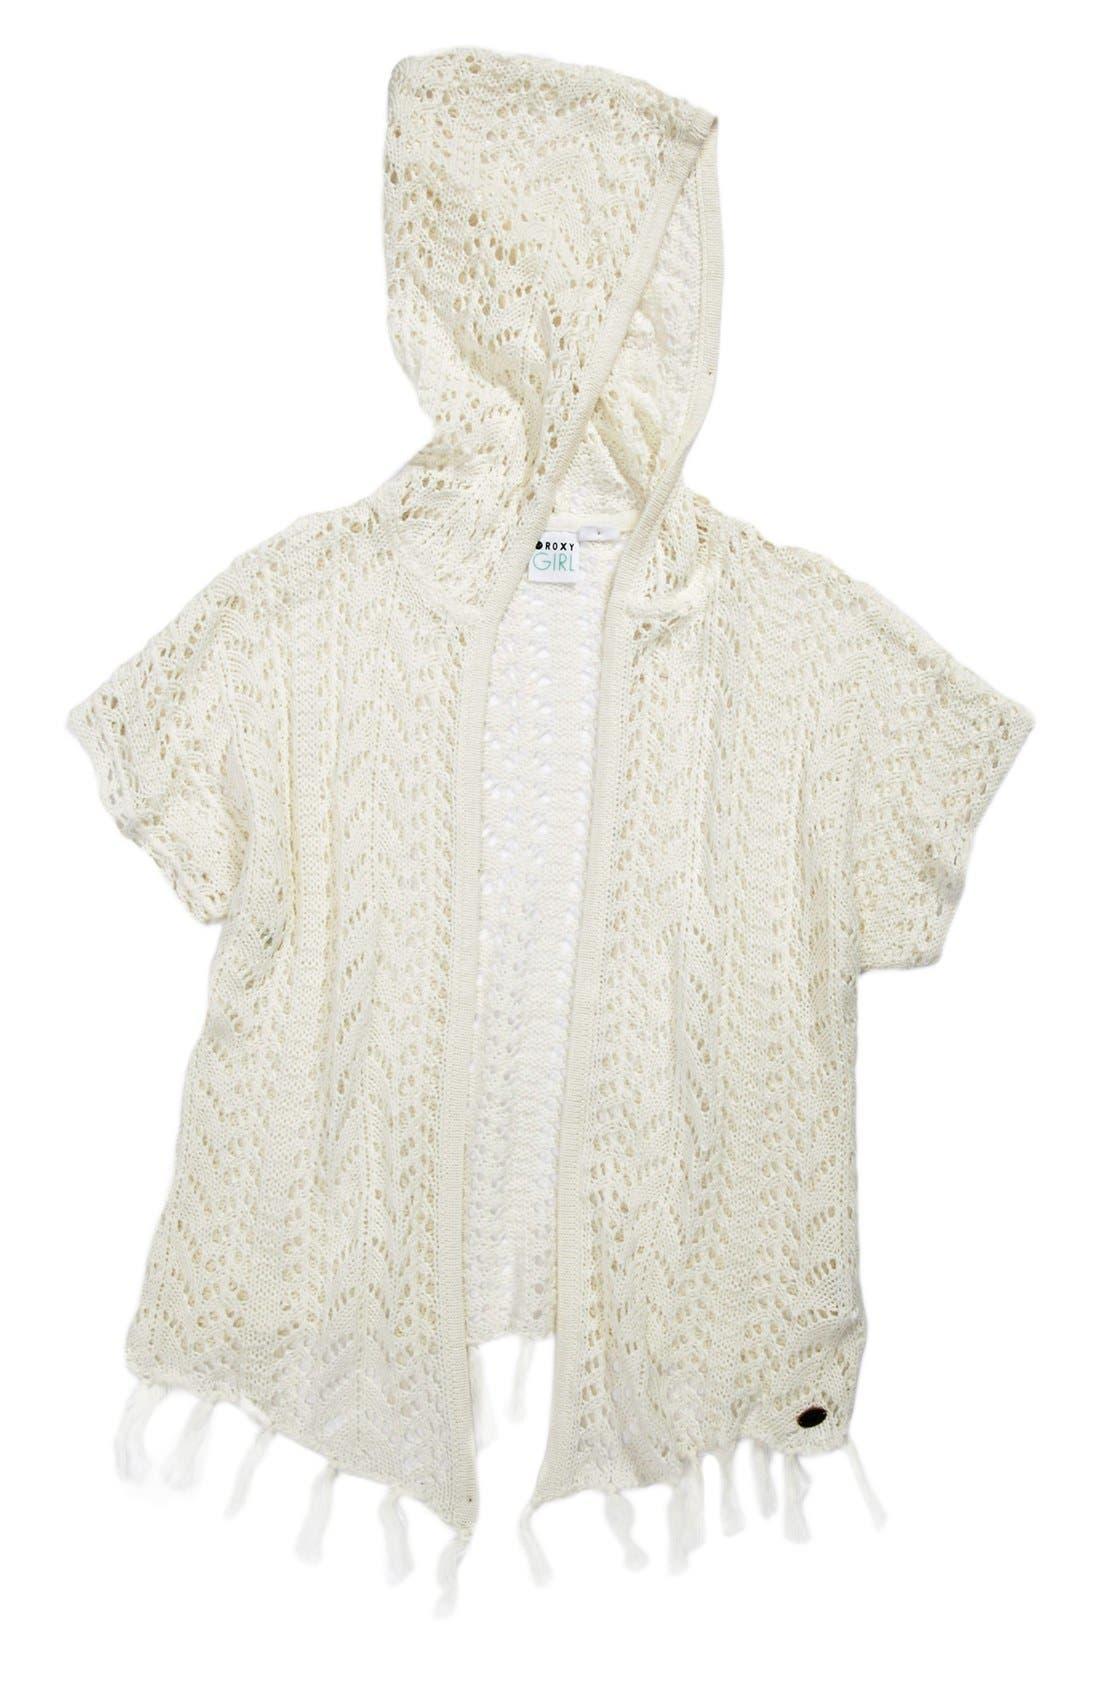 Main Image - 'Dancing Waves' Crochet Hooded Sweater (Big Girls)